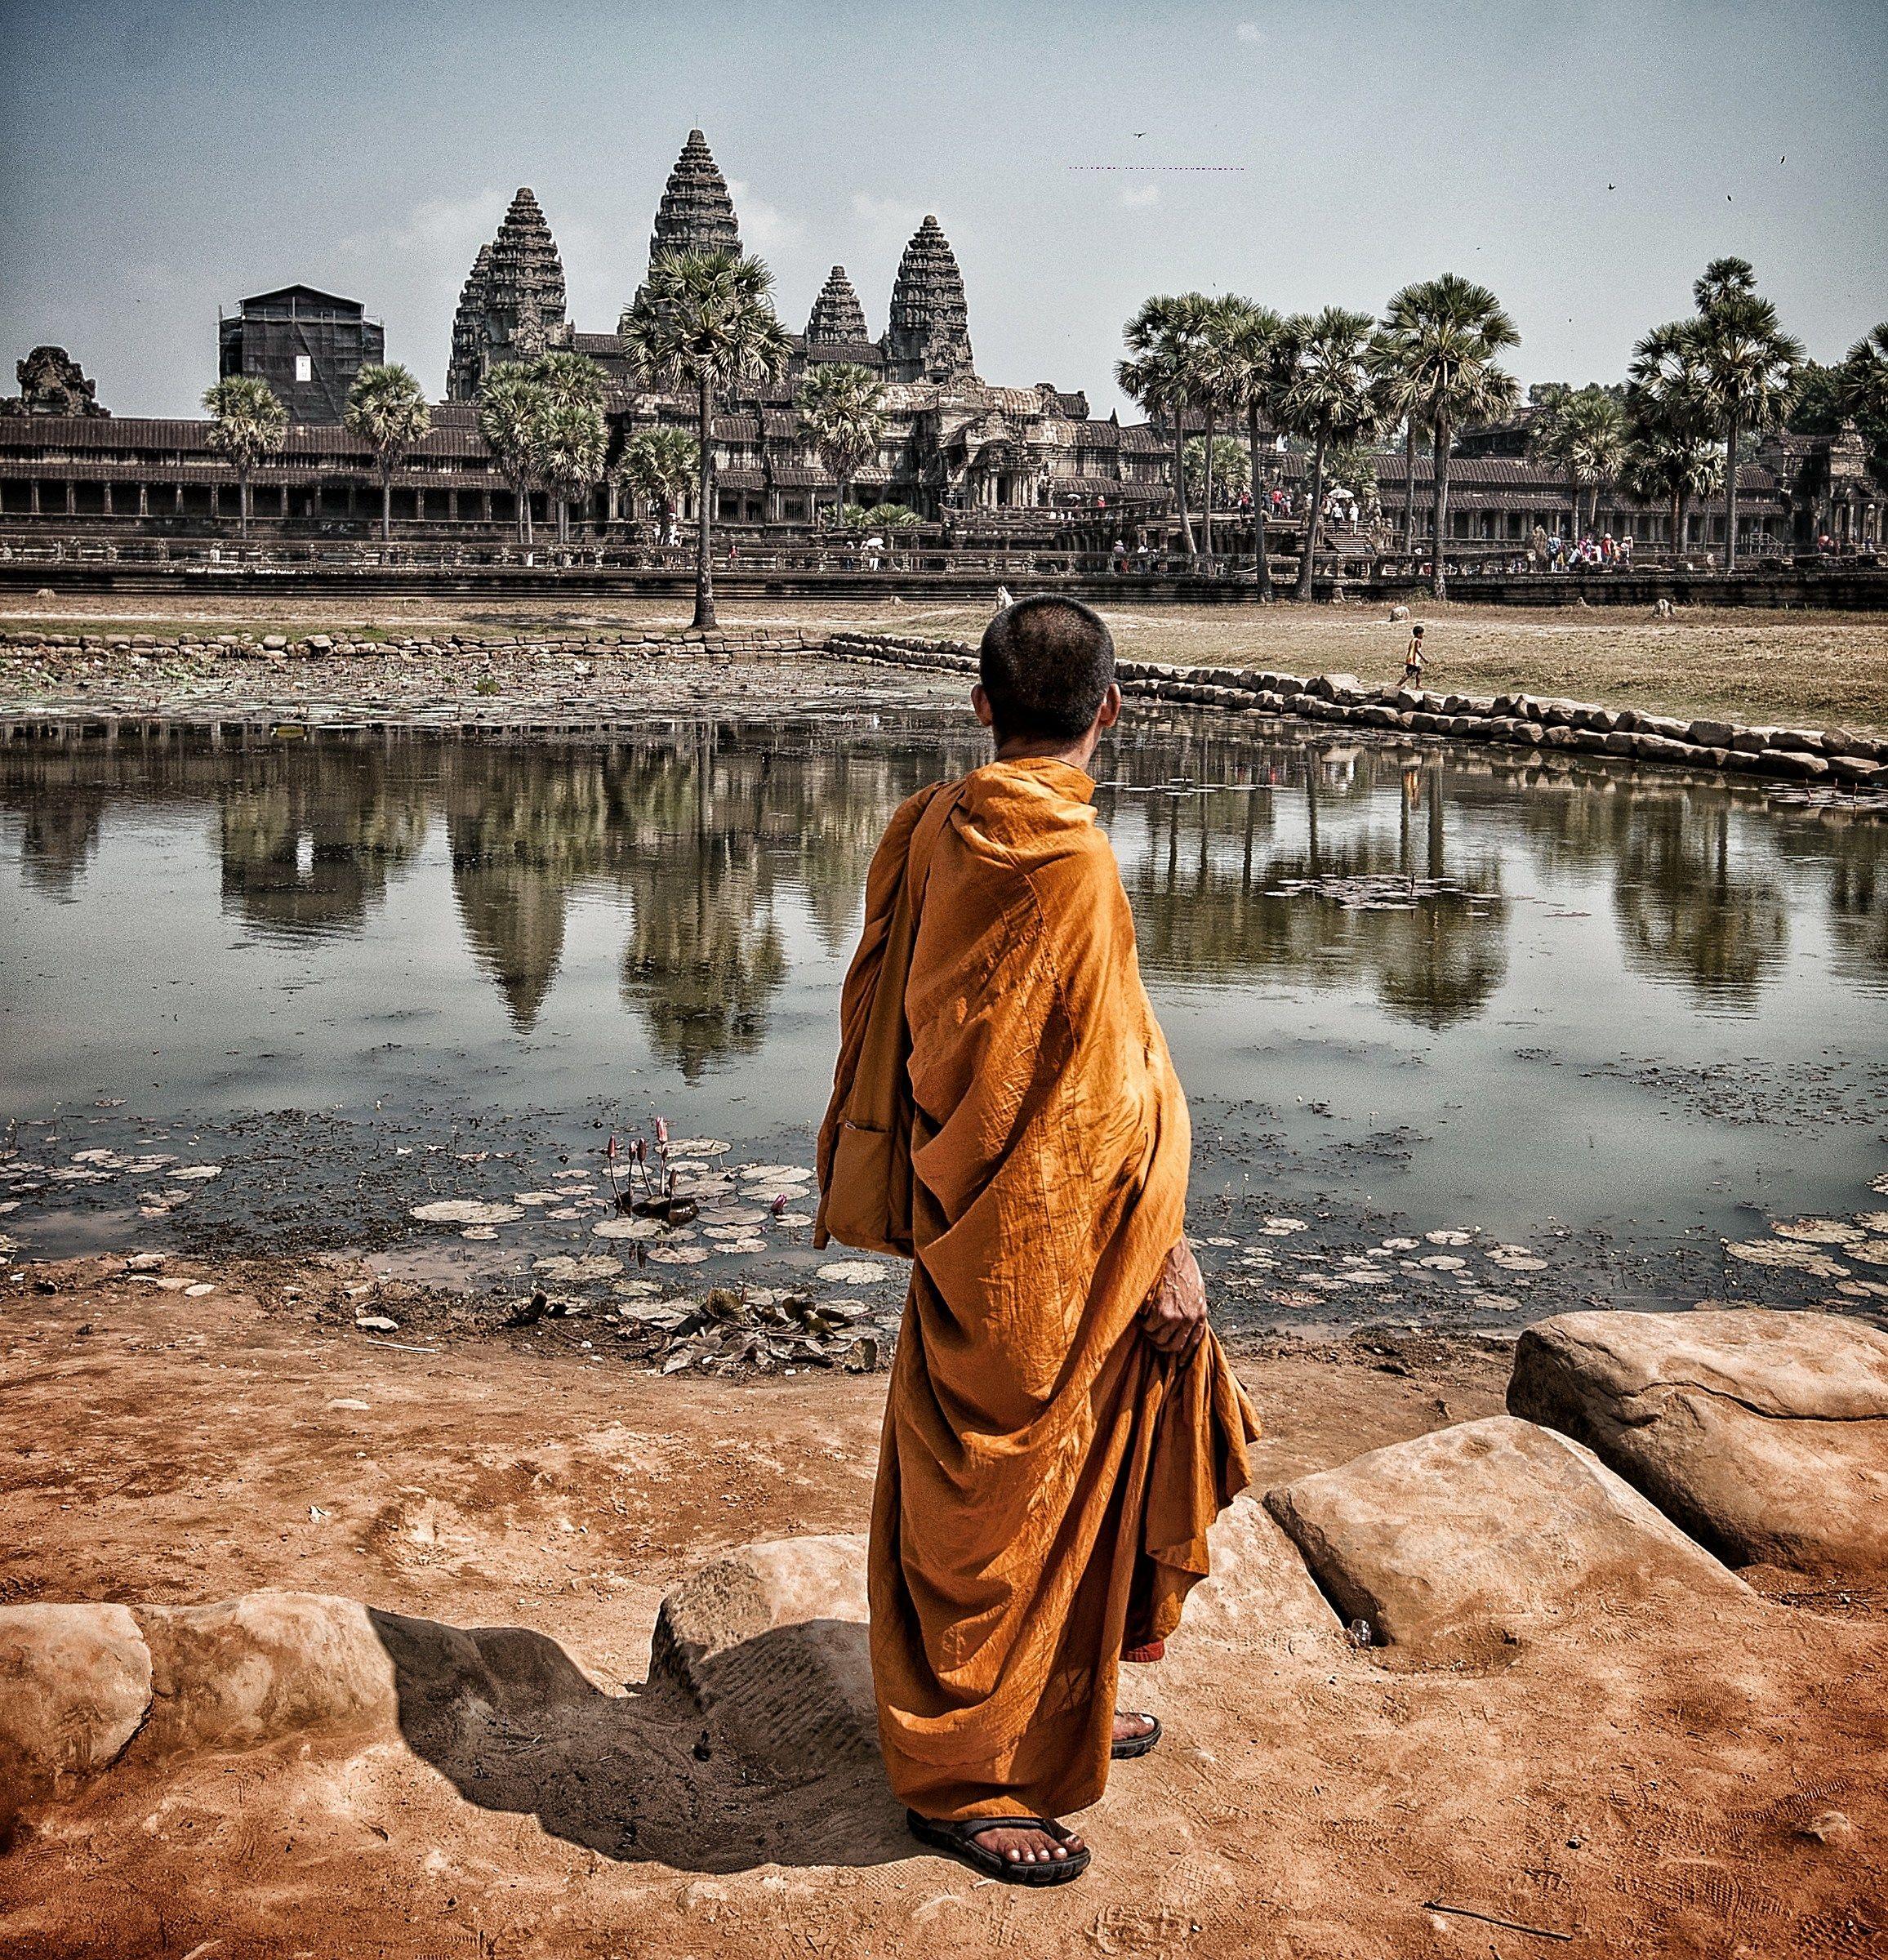 uno sguardo all'Angkor...